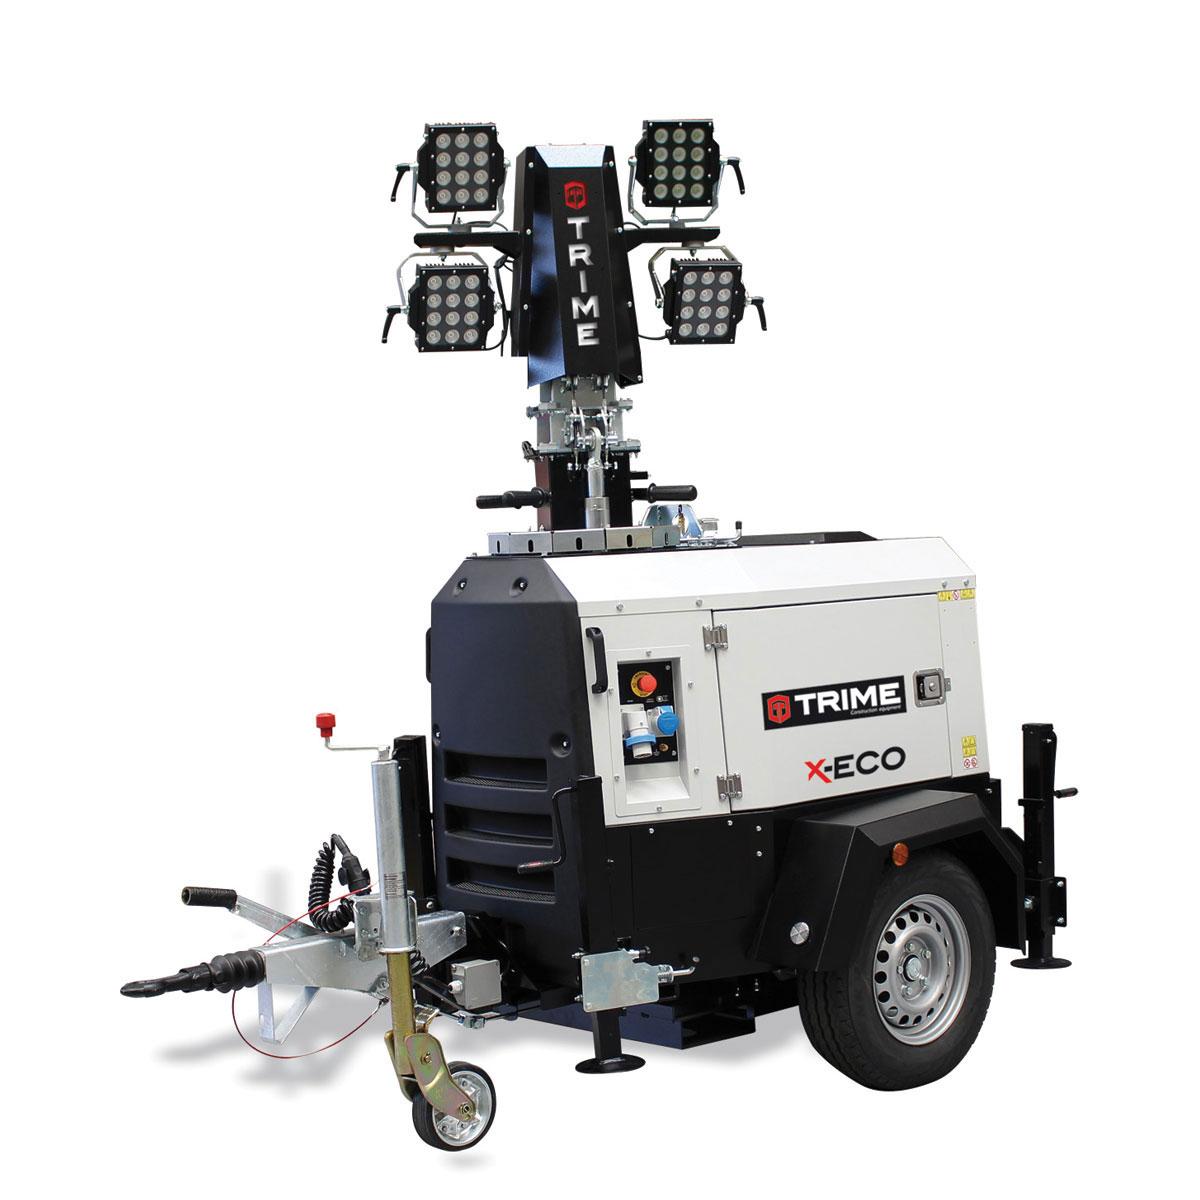 belysningsmast-led-x-eco-4x150W-48V-stangd